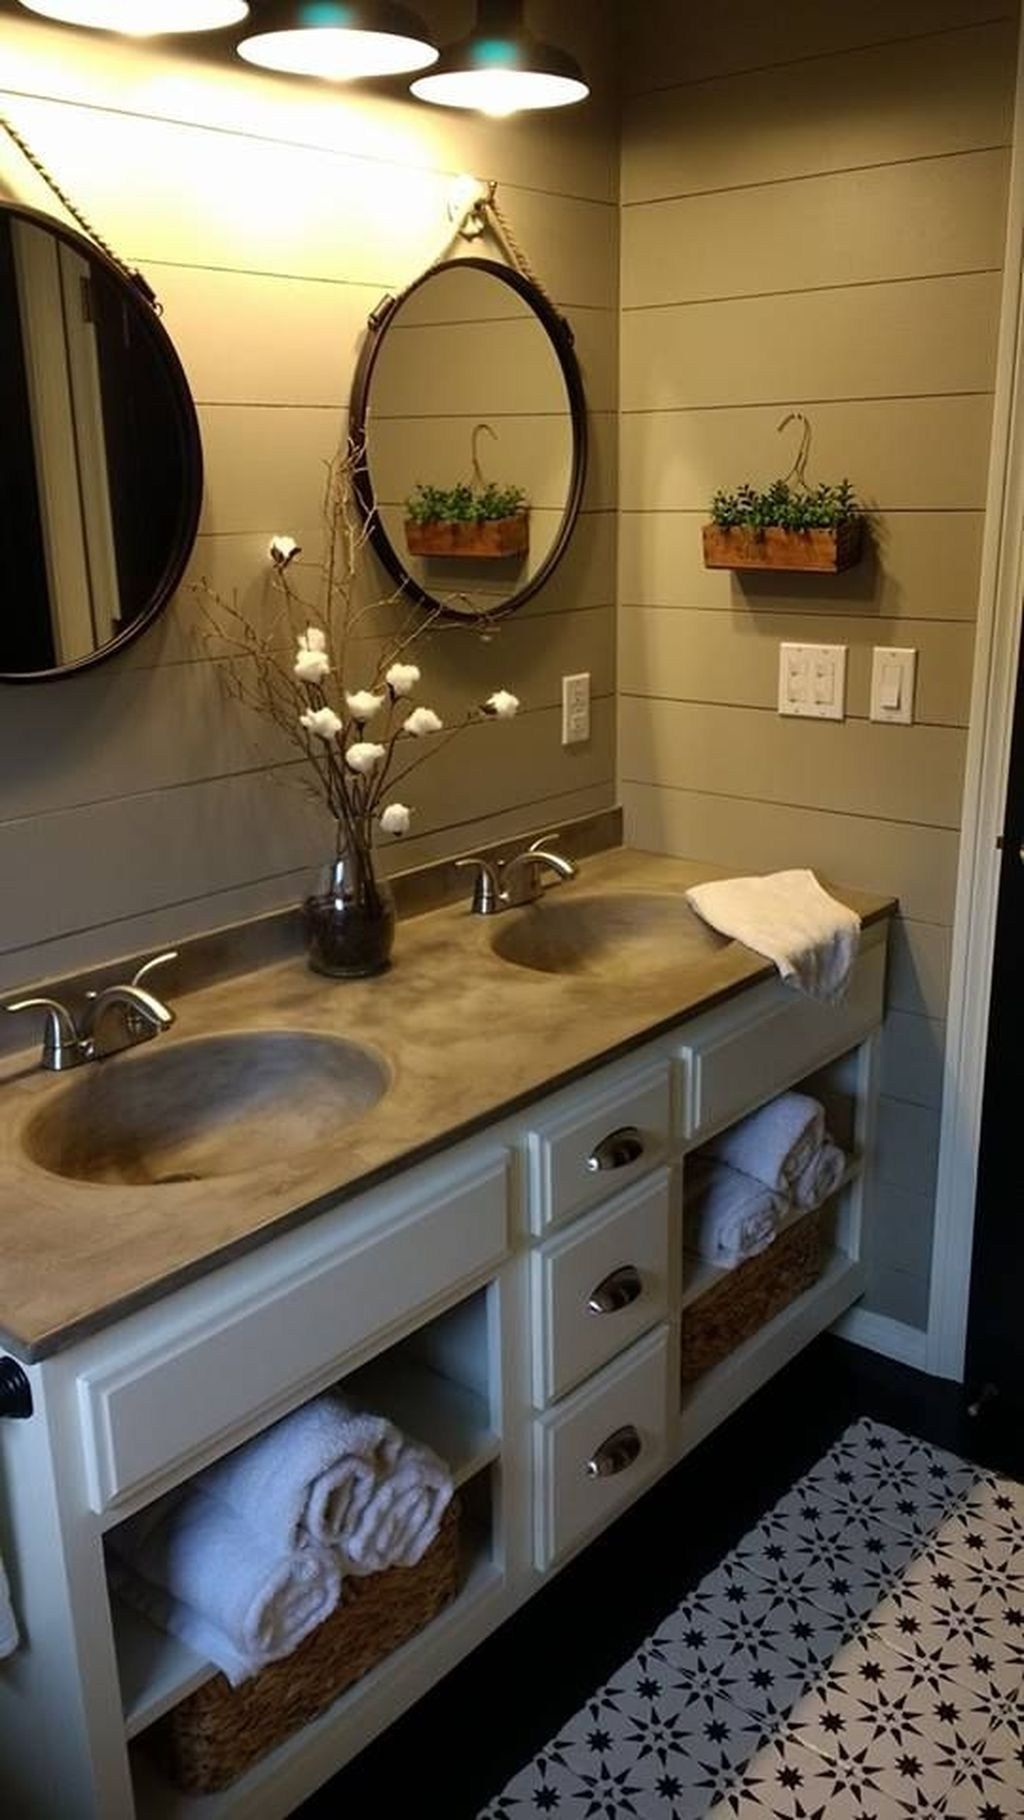 Cheap And Easy Diy Bathroom Vanity Makeover Ideas 40 Diy Bathroom Vanity Makeover Bathroom Vanity Makeover Diy Bathroom Vanity